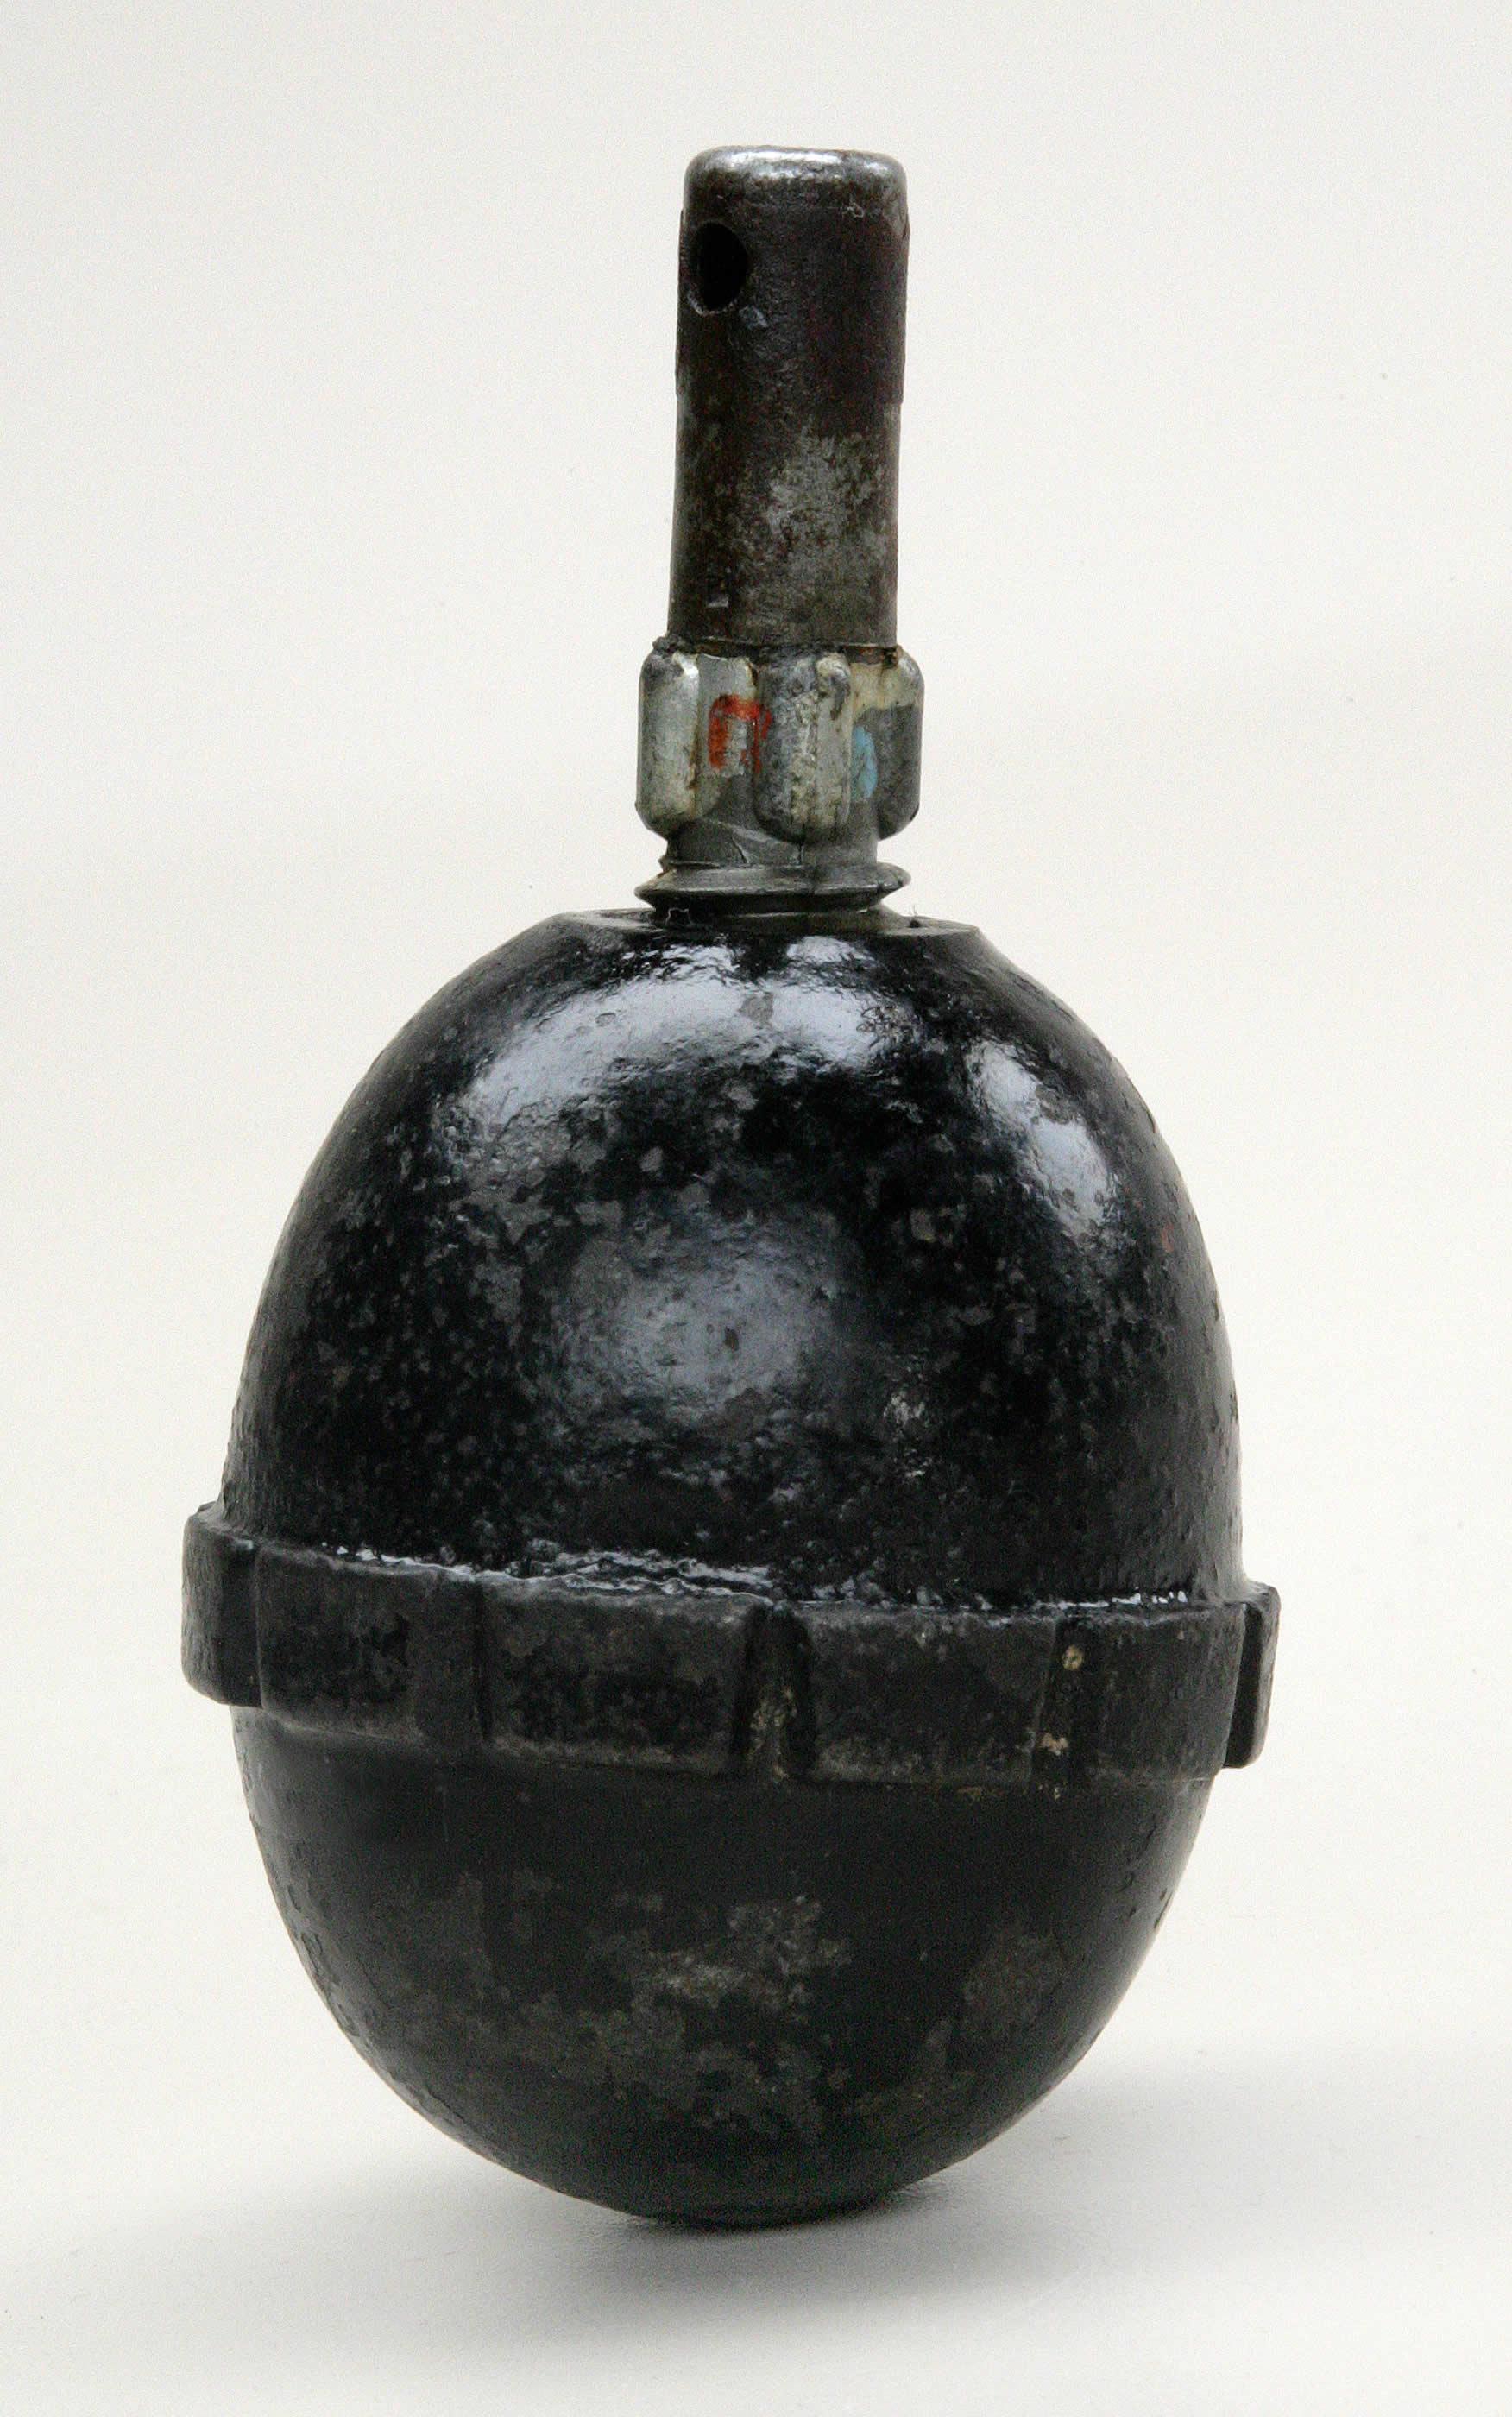 German Egg Grenade